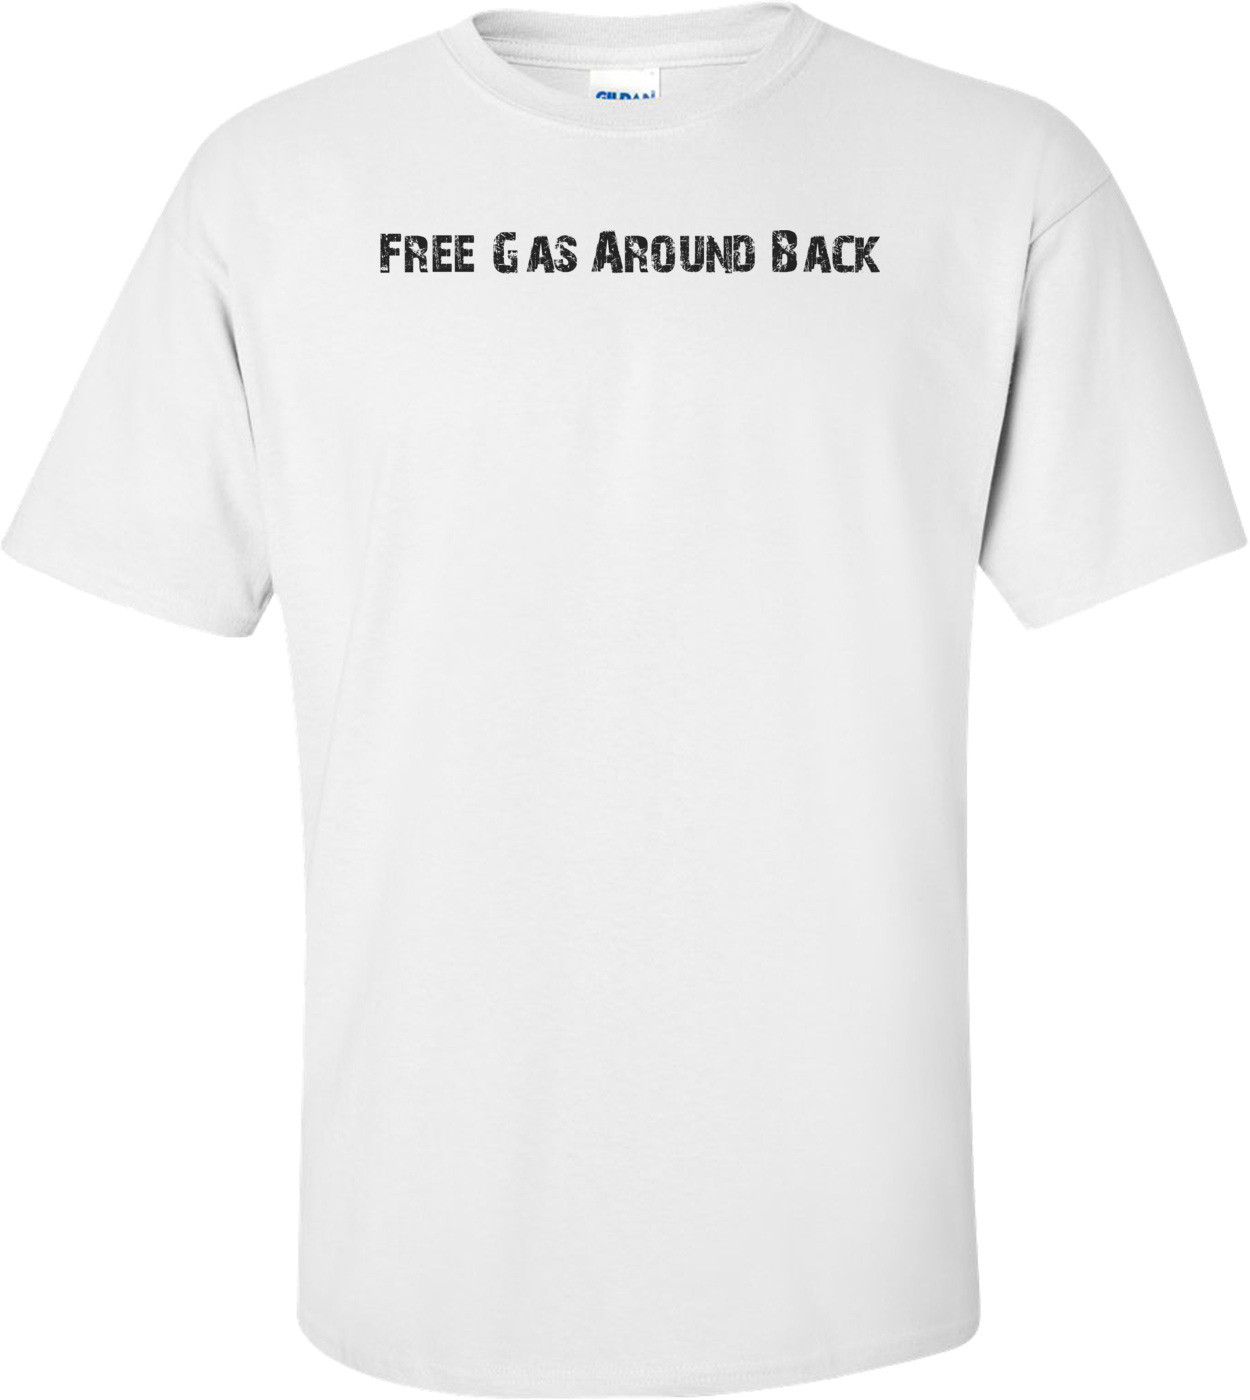 Free Gas Around Back T-Shirt